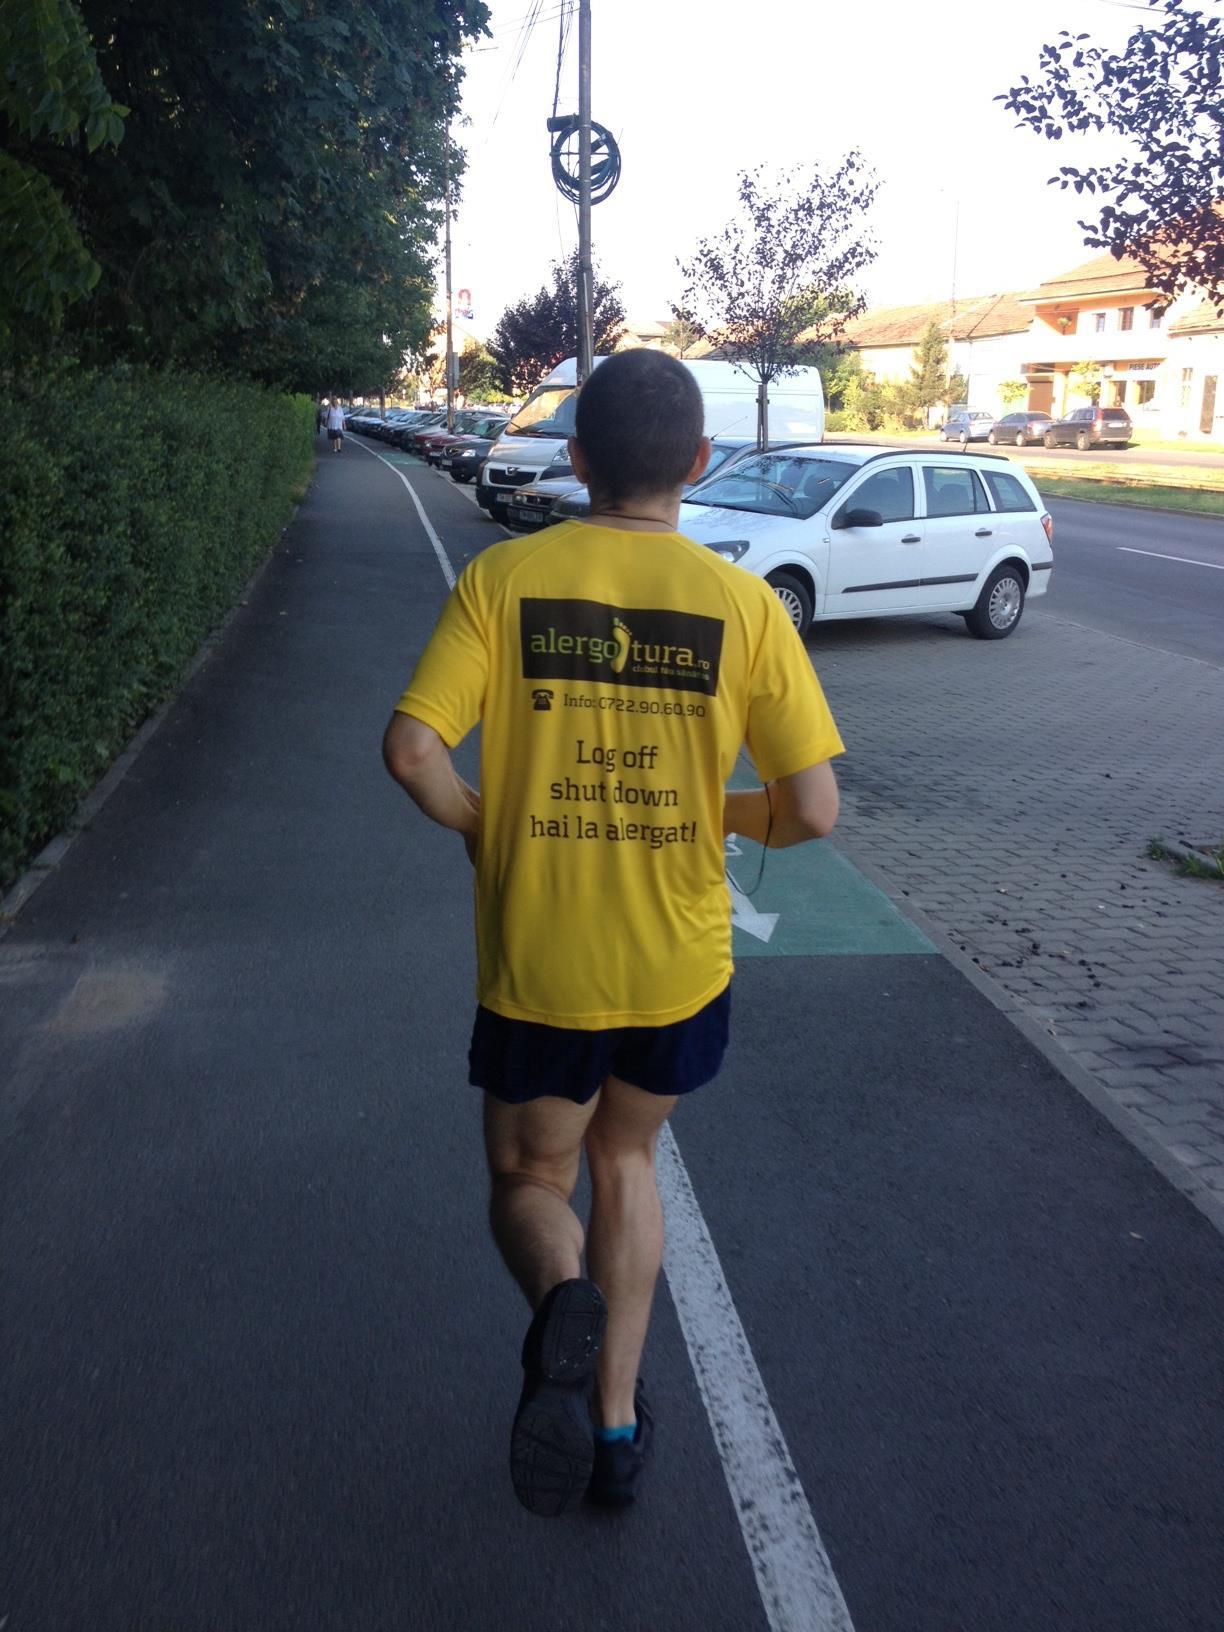 Jogging de dimineata pe stomacul gol la prima alergotura cu echipament oficial